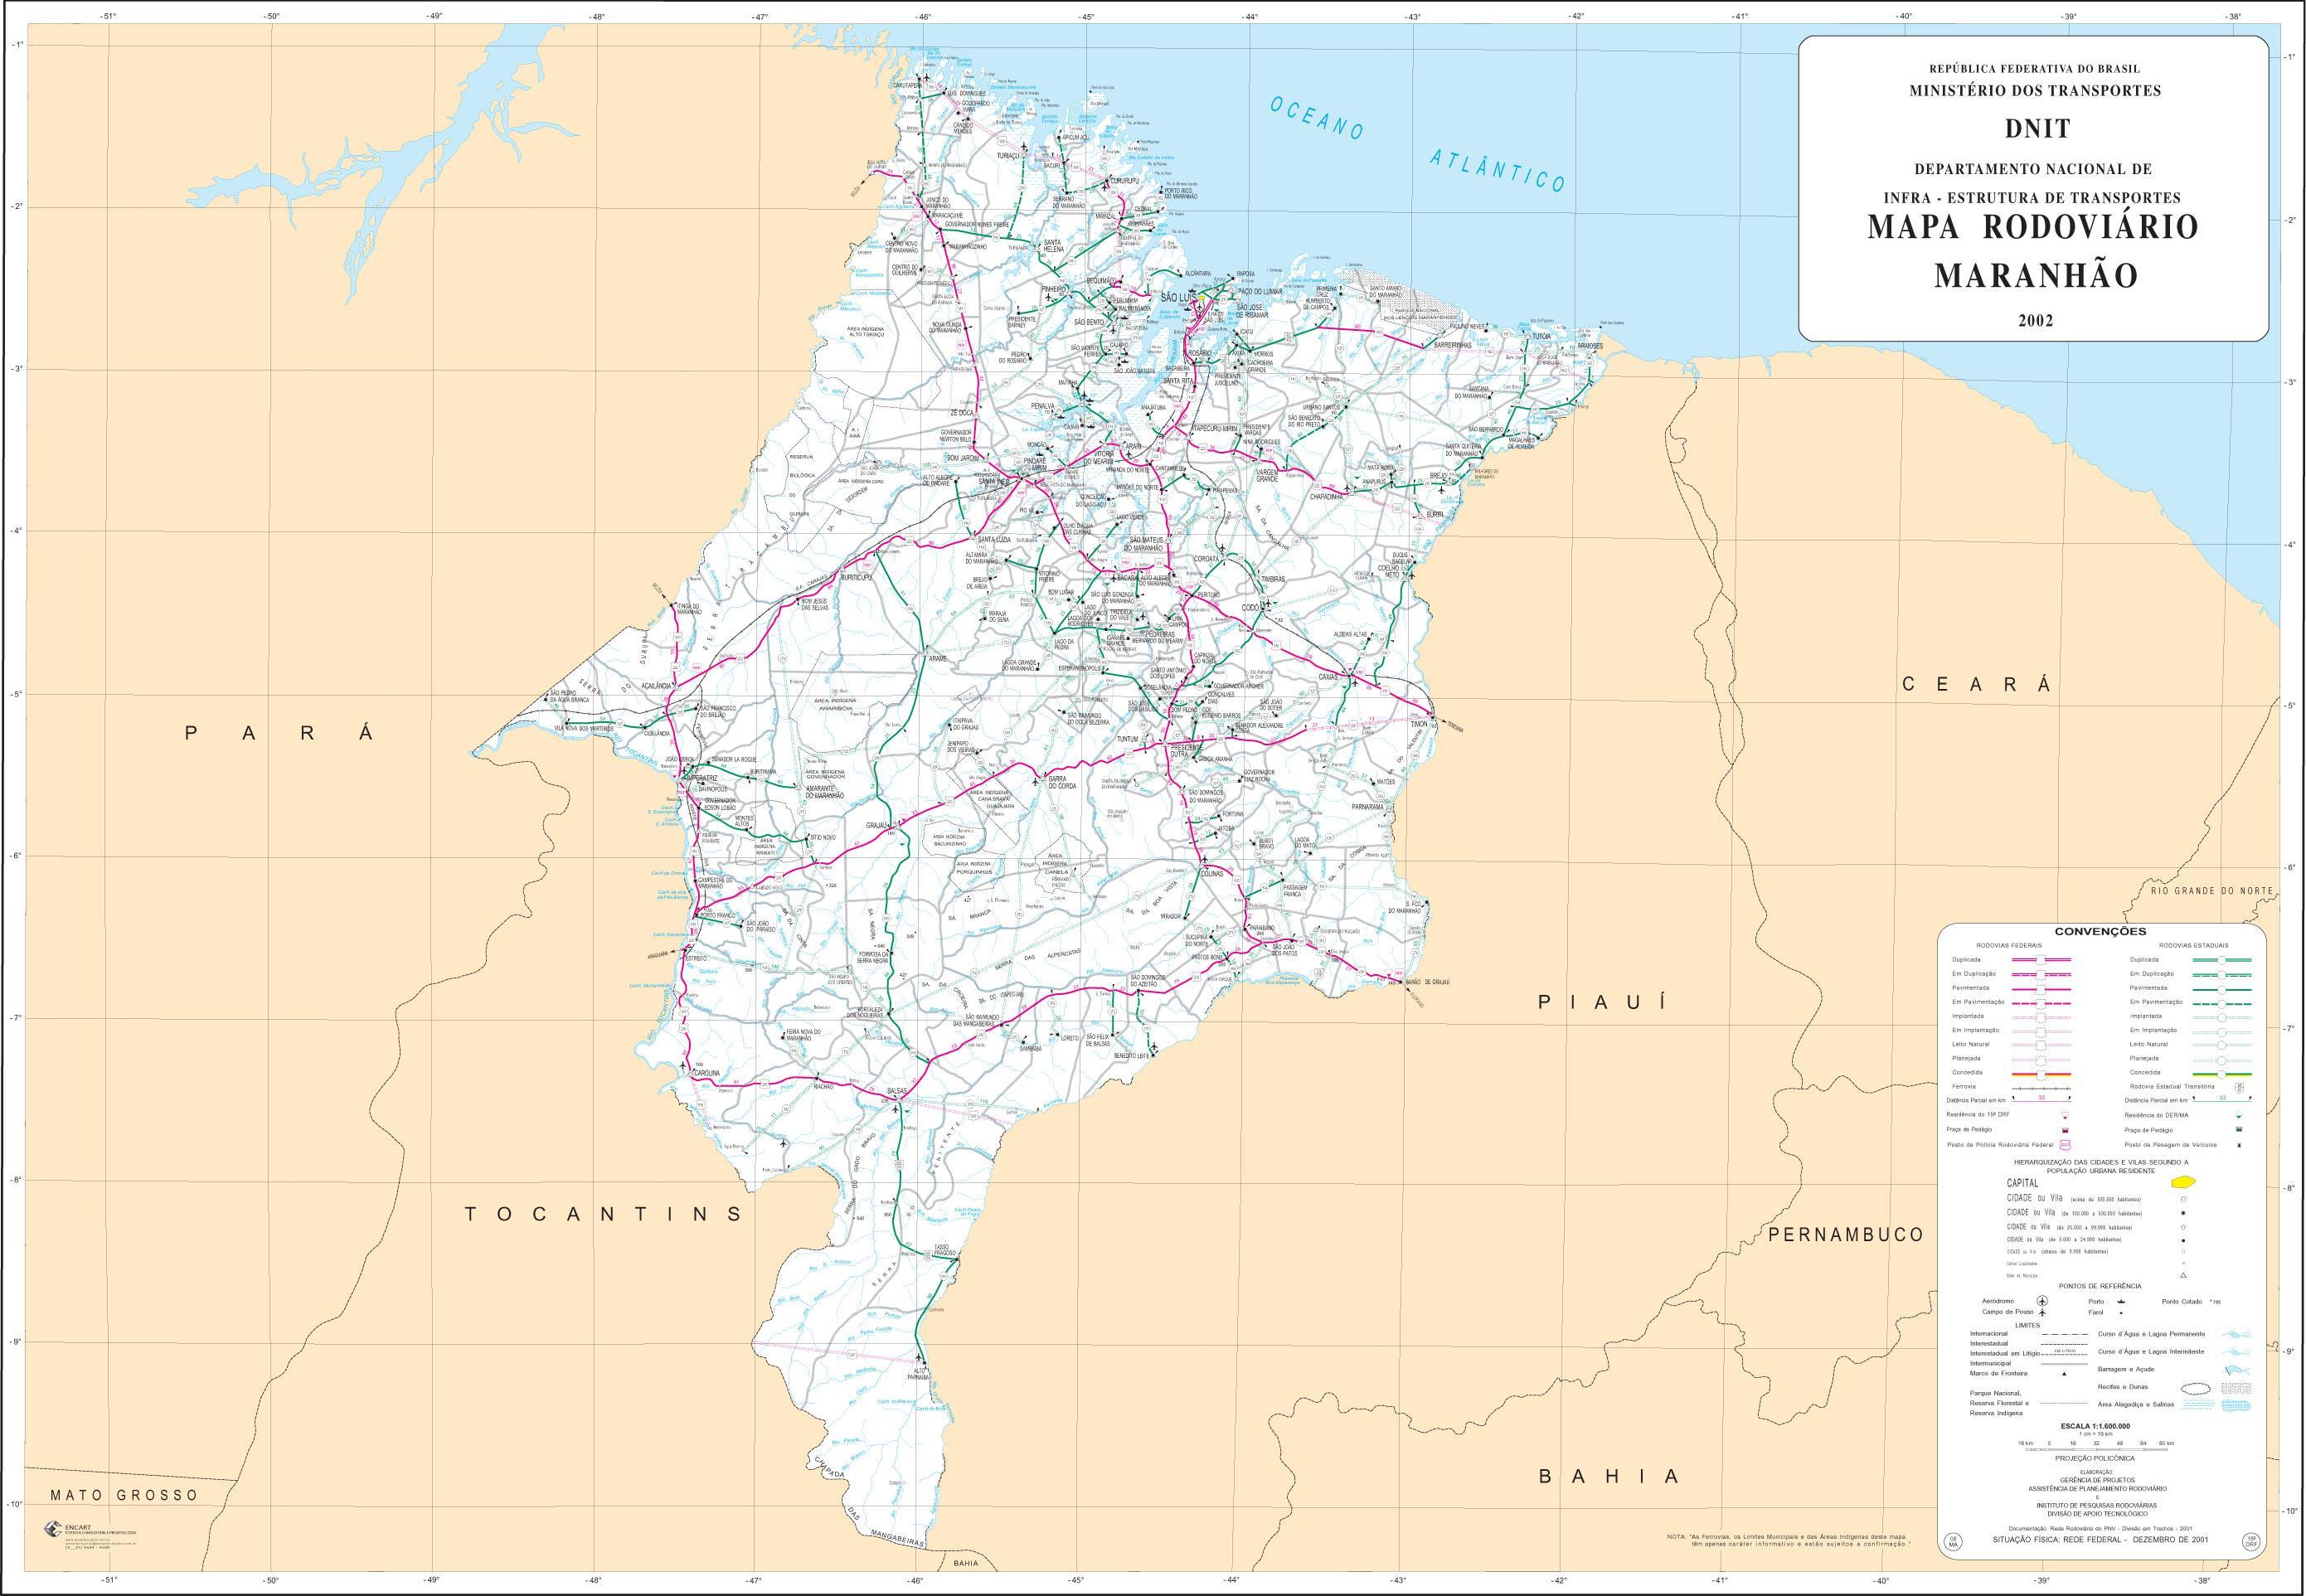 Maranhão State Road Map, Brazil